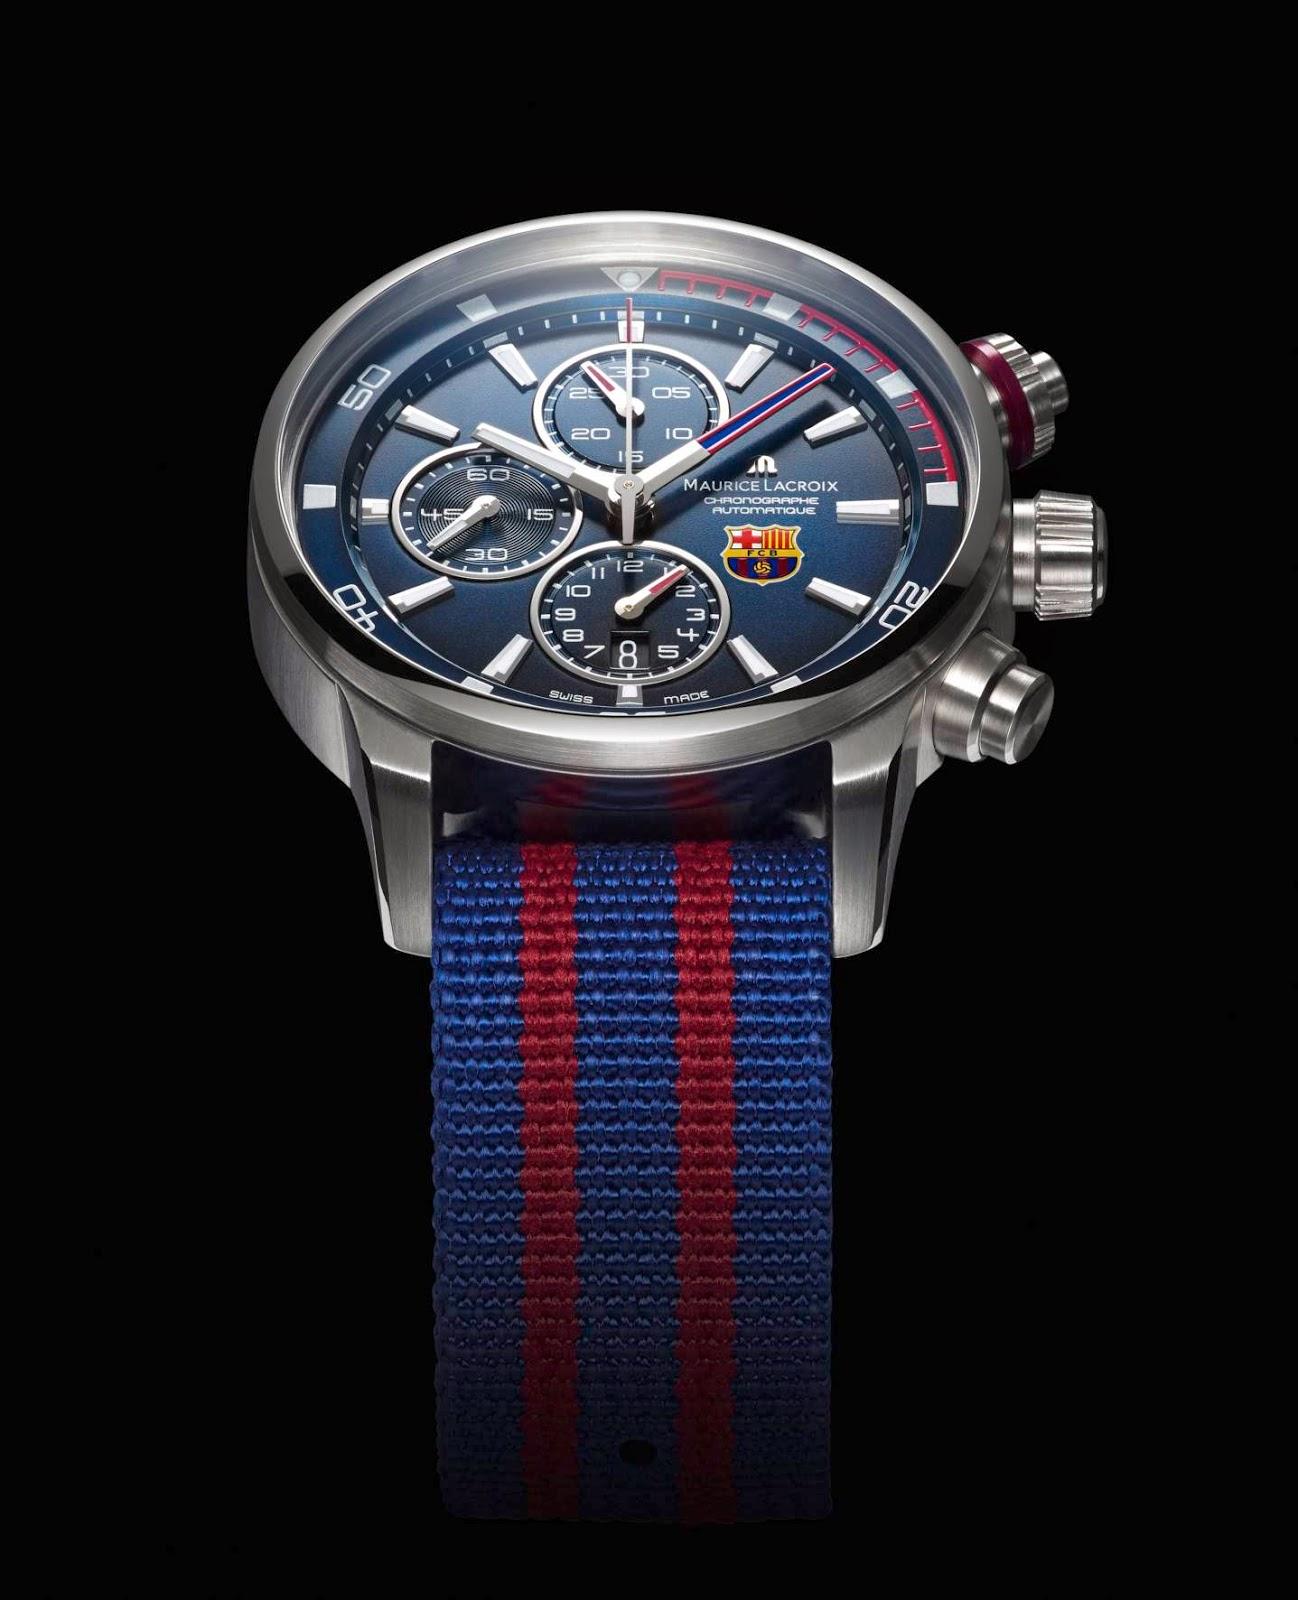 Maurice Lacroix Pontos S Chronograph for FC Barcelona (Nato Strap)